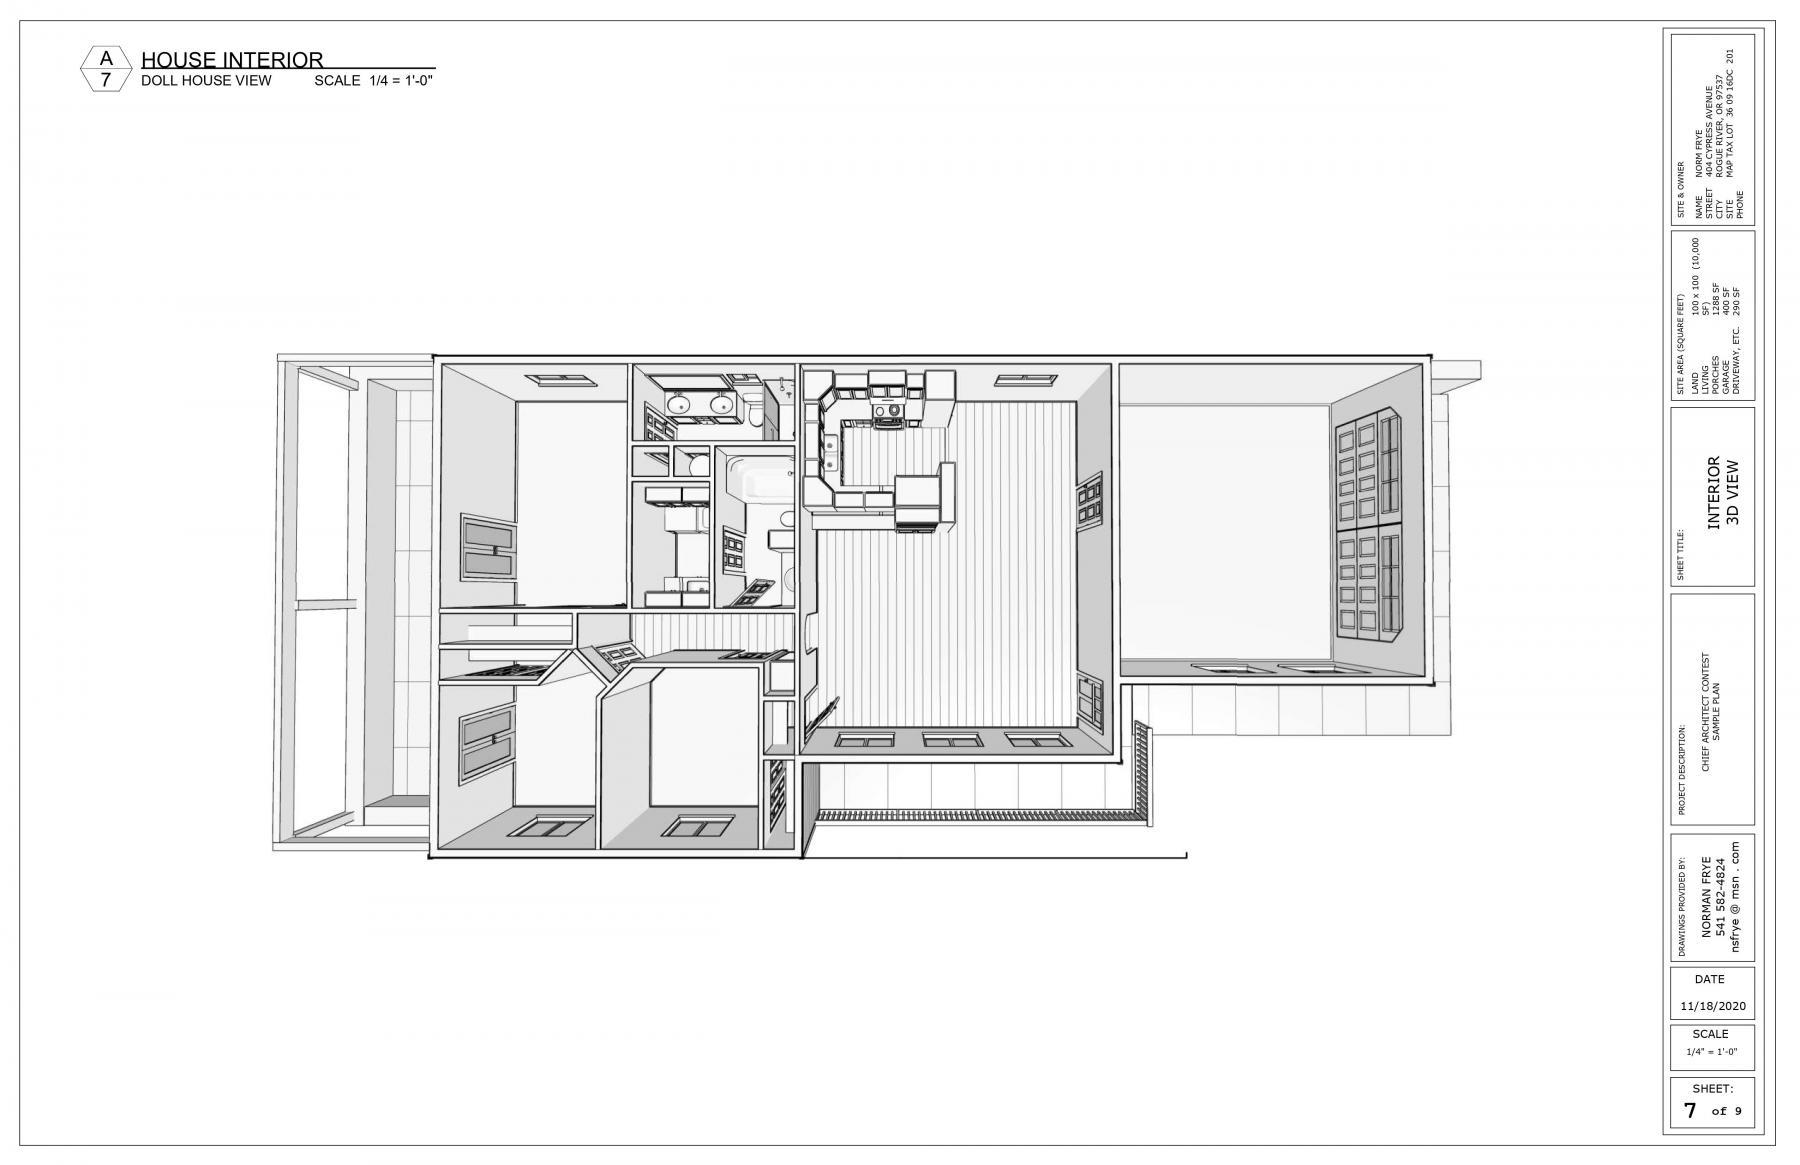 Norman's Winning Design Dollhouse View.